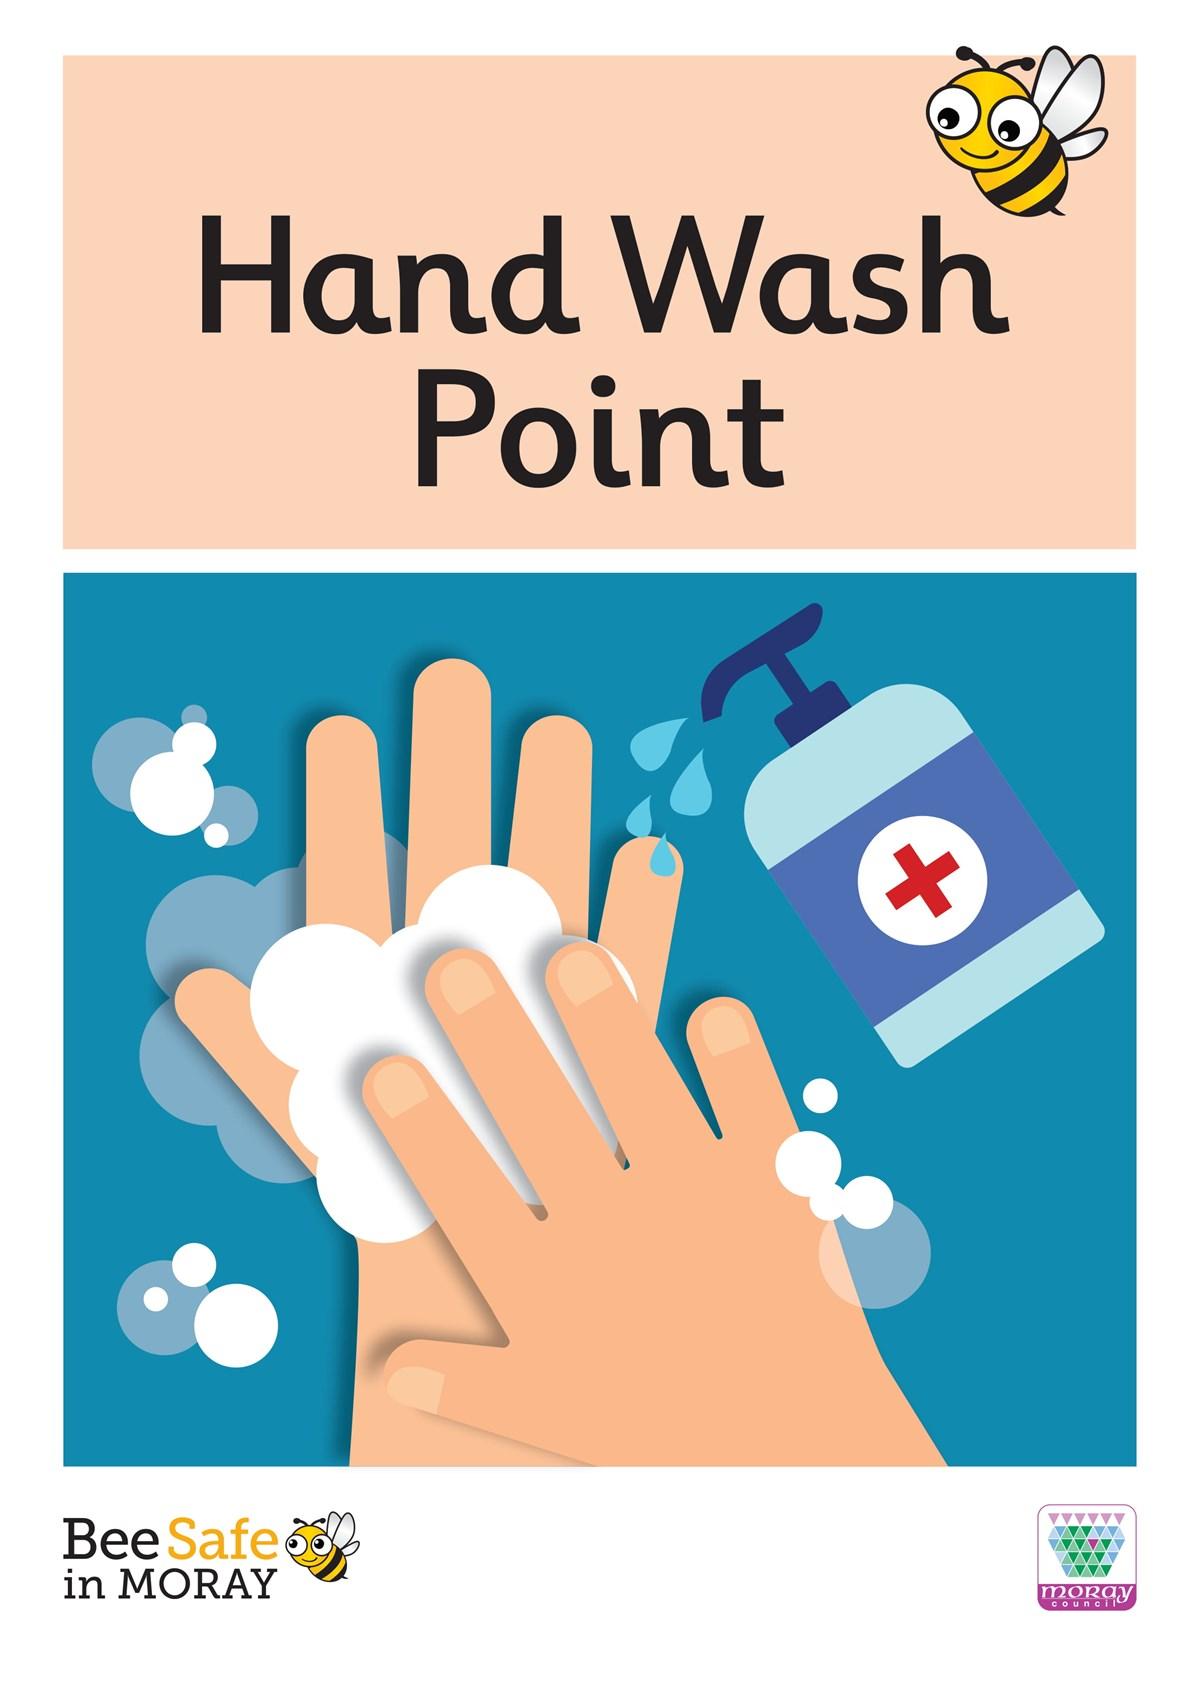 Bee Safe - hand wash point